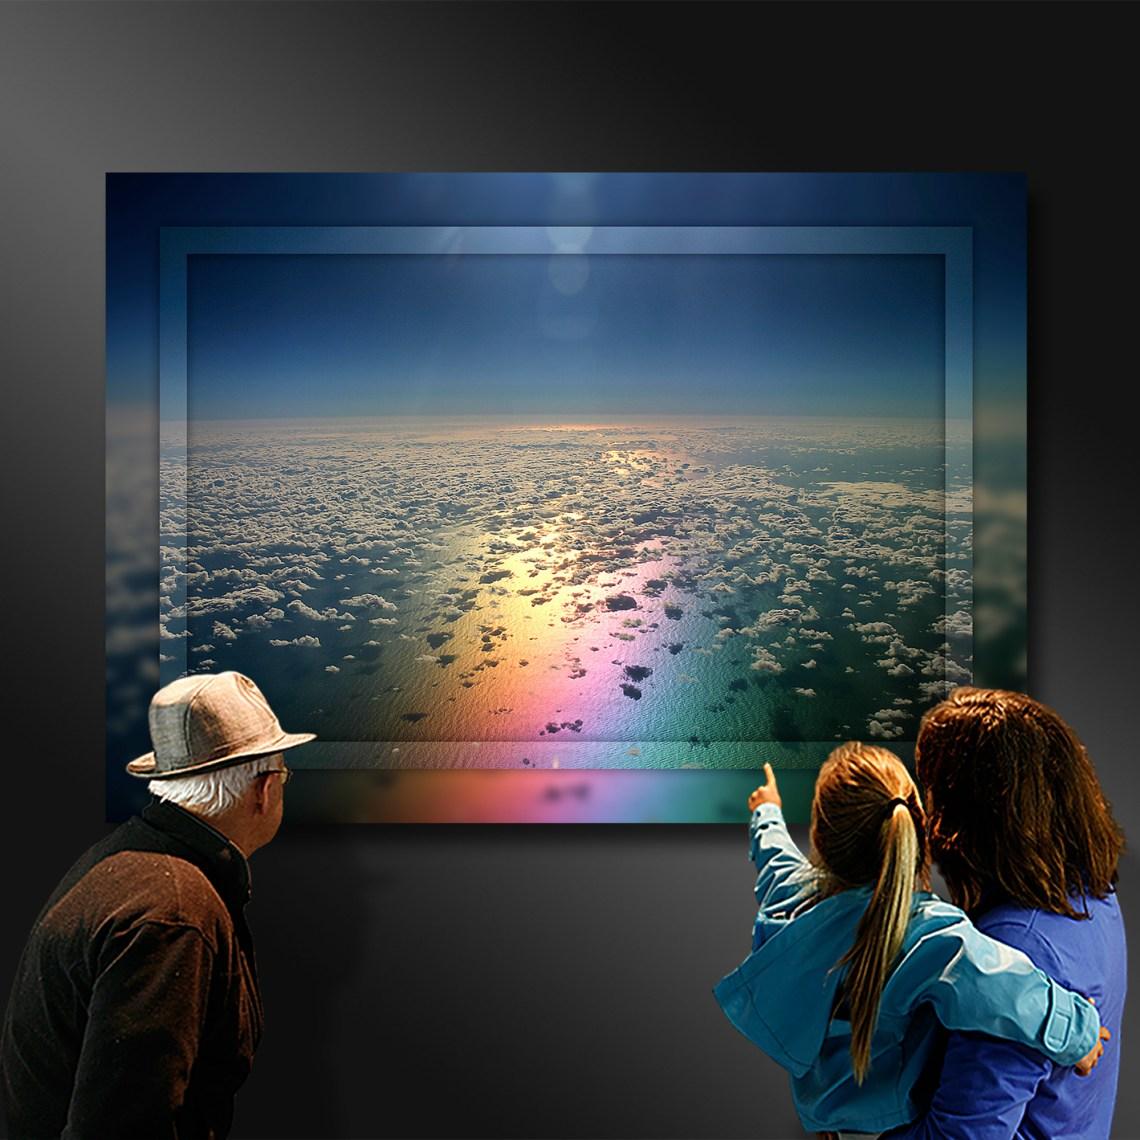 Rainbows end where the earth and heaven meet